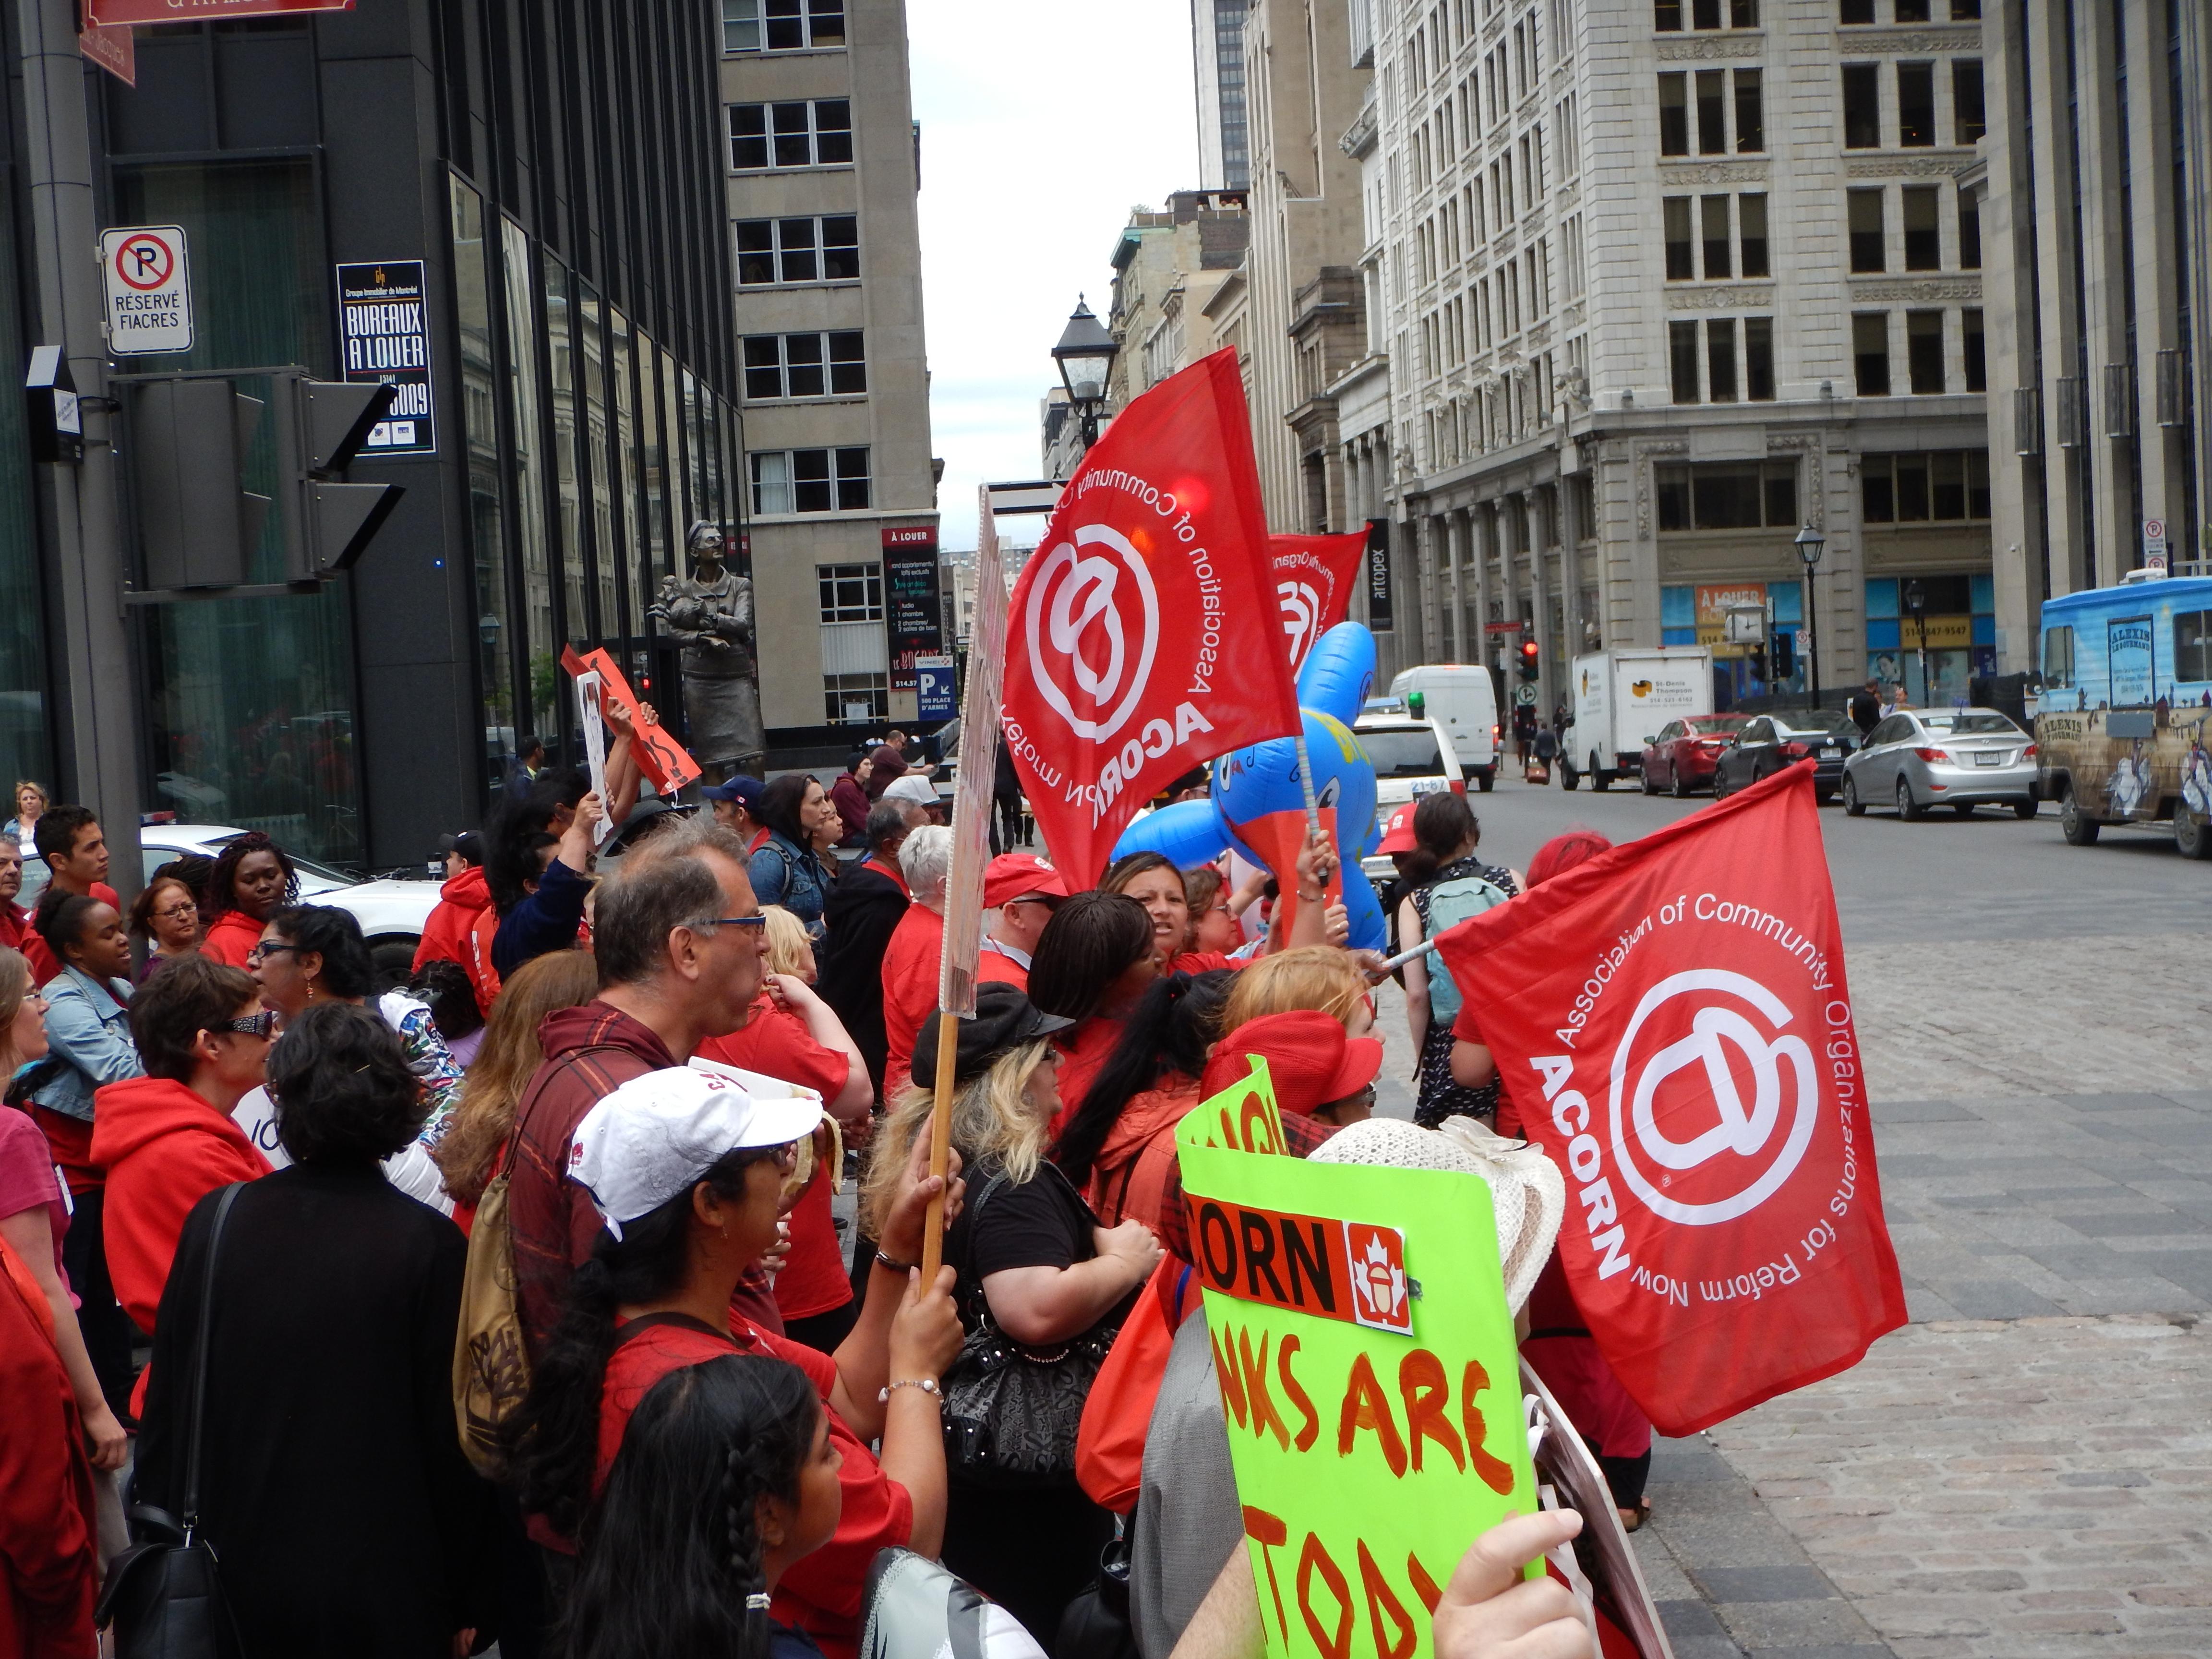 ACORN_Canada_Bank_Action_2015.JPG